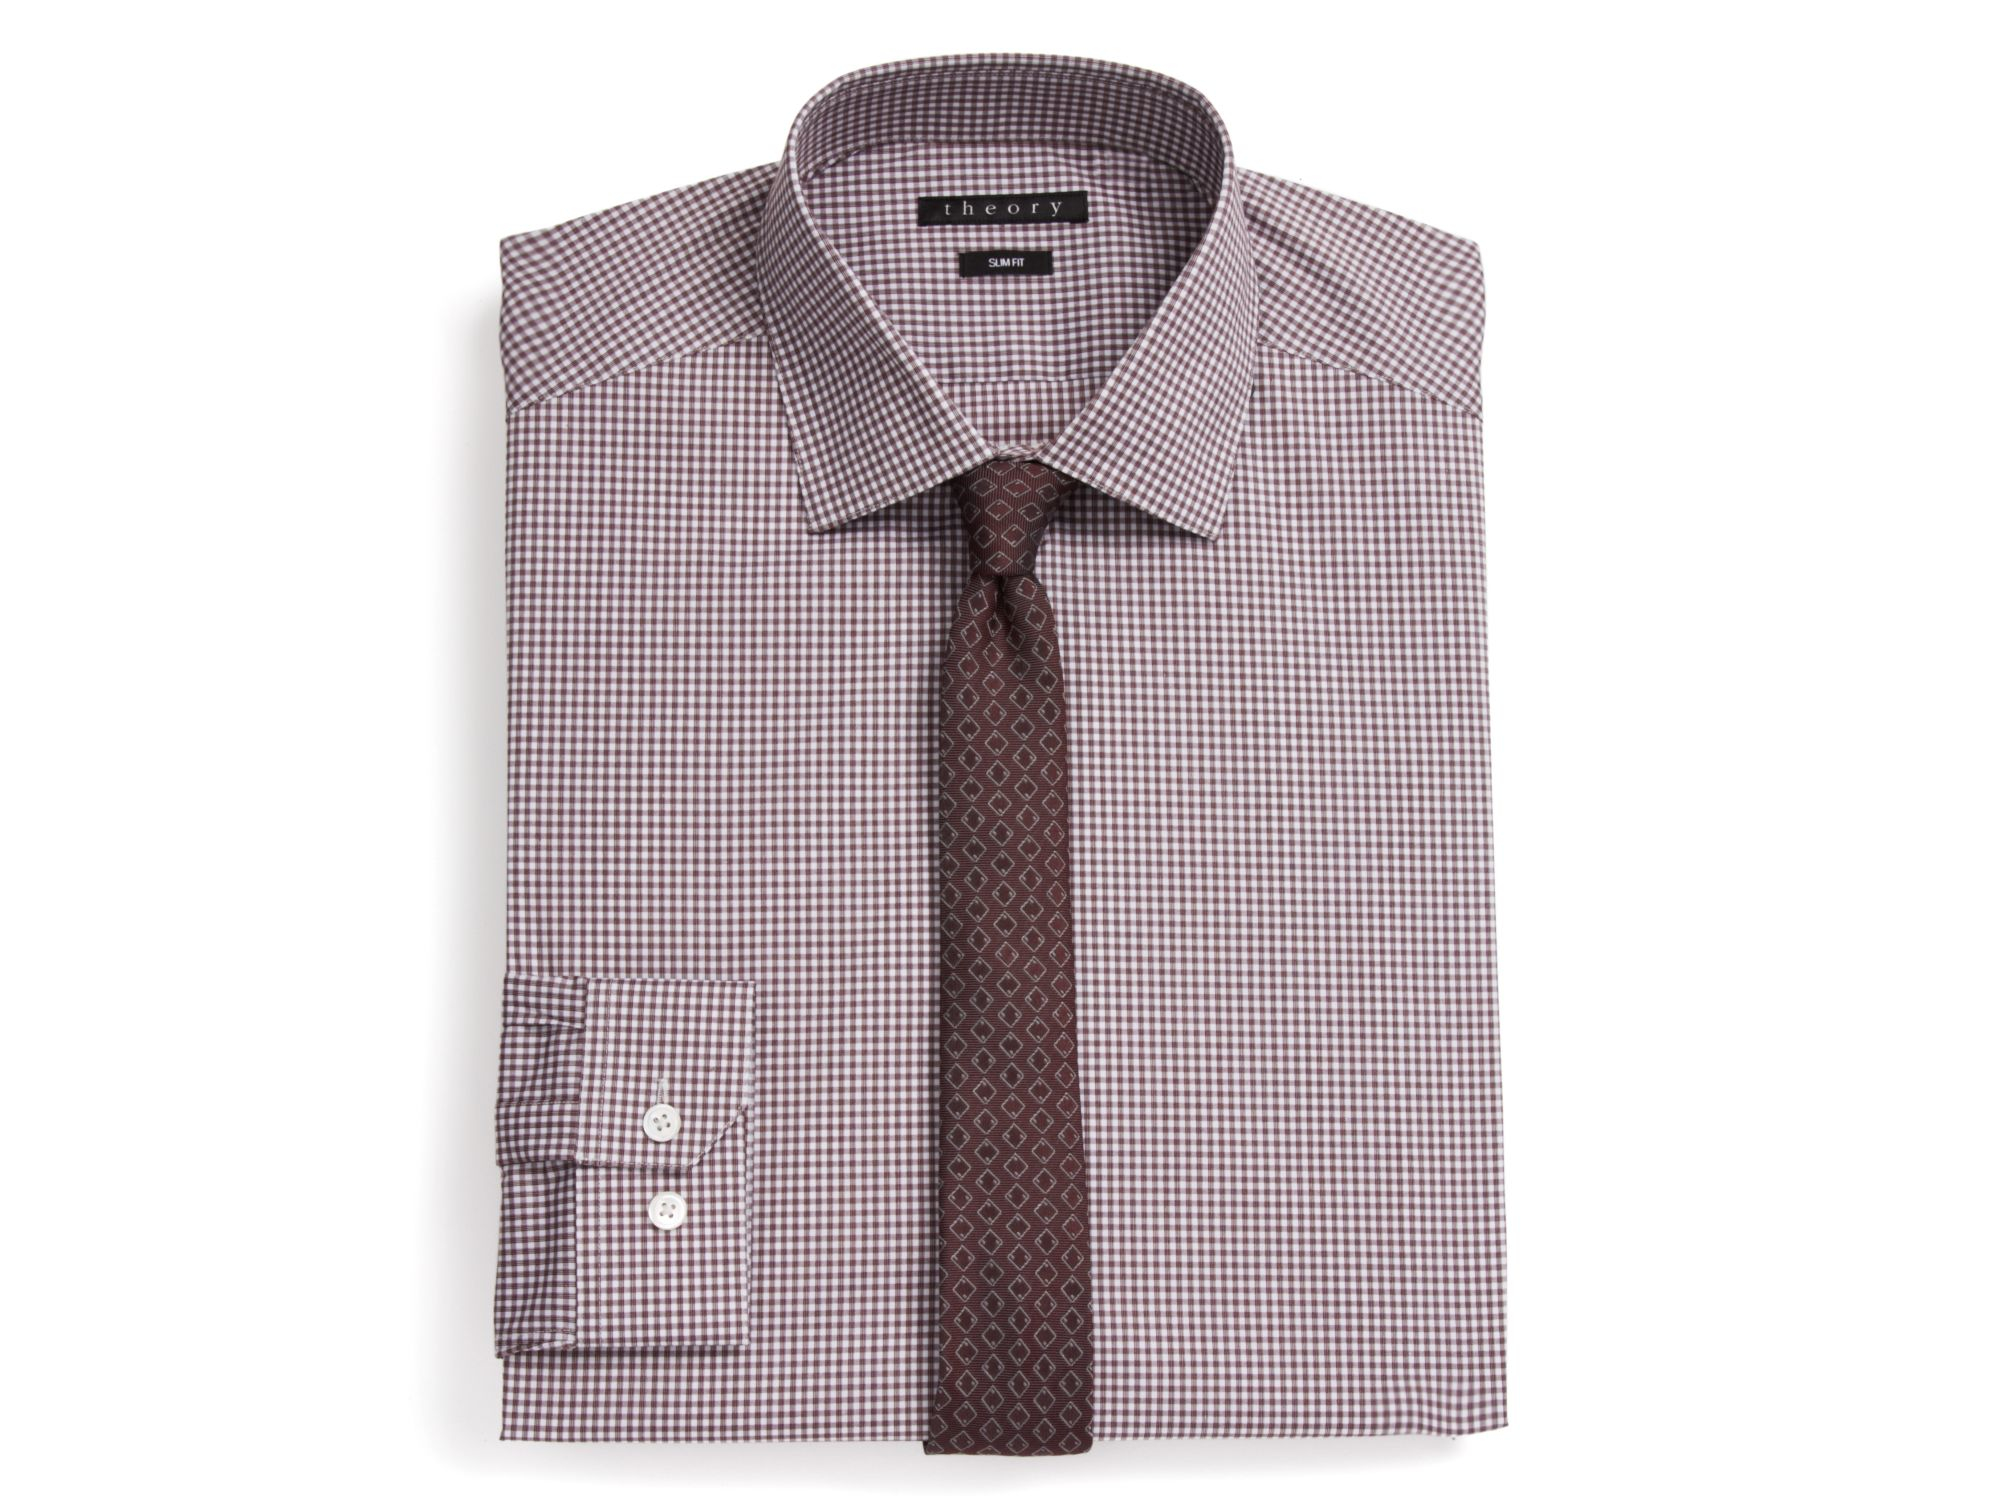 Theory Sheldon Gingham Check Dress Shirt Slim Fit In